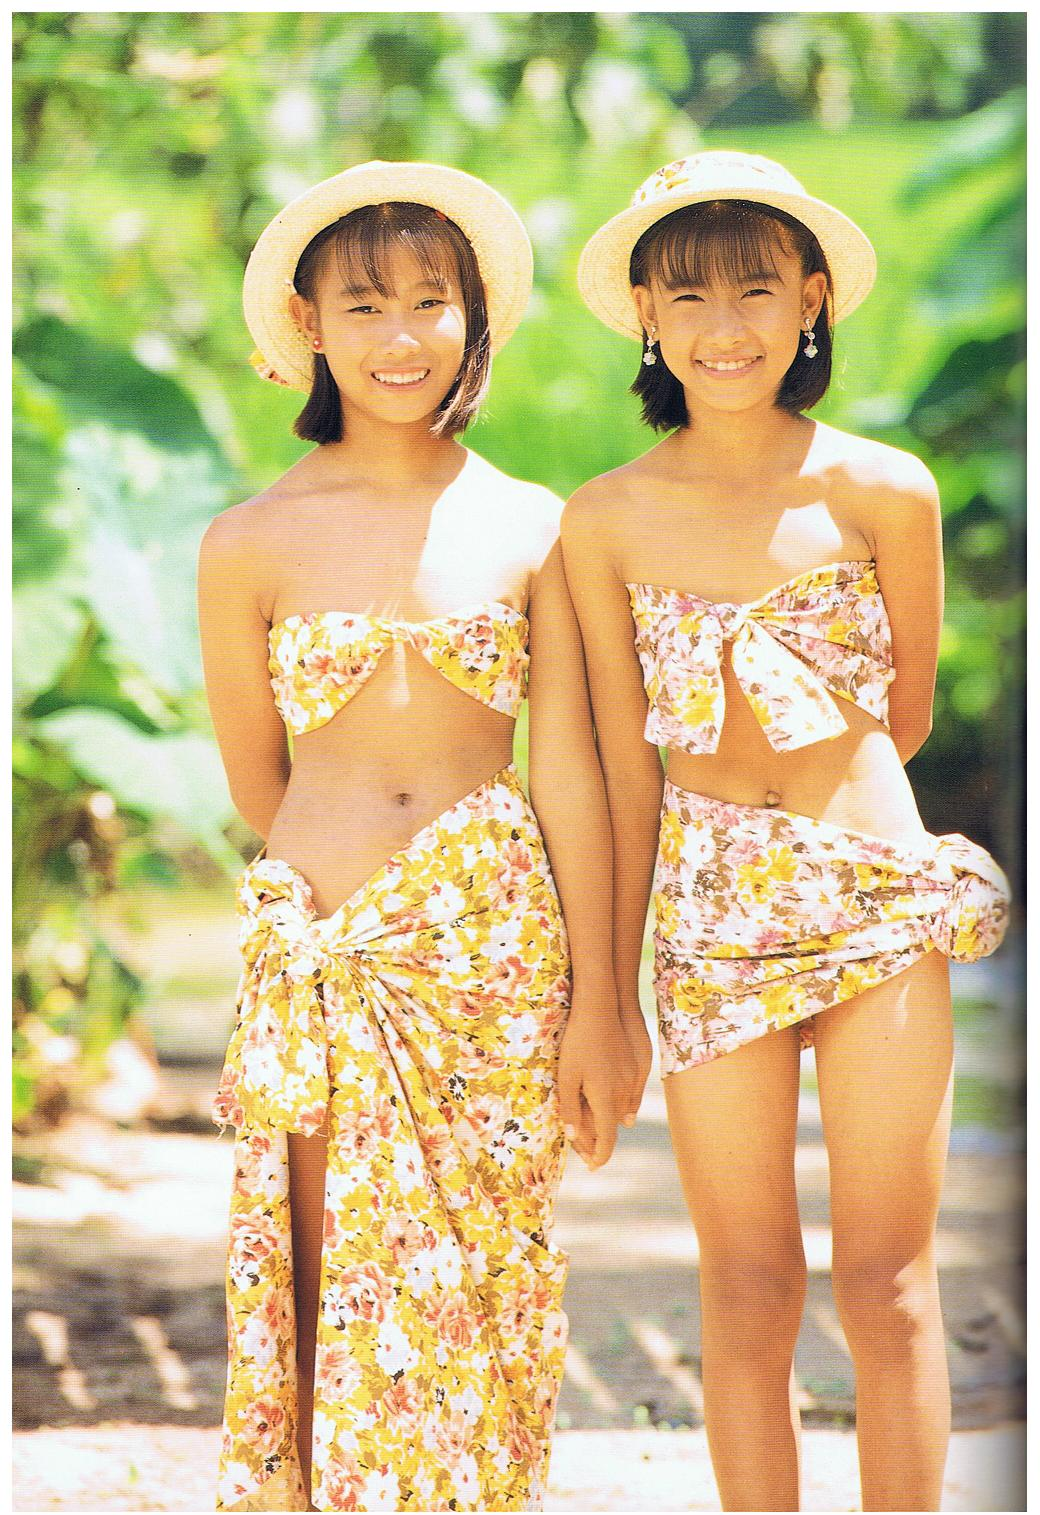 Reona Satomi Hiromoto Nude Pictures And Photos Reona ...